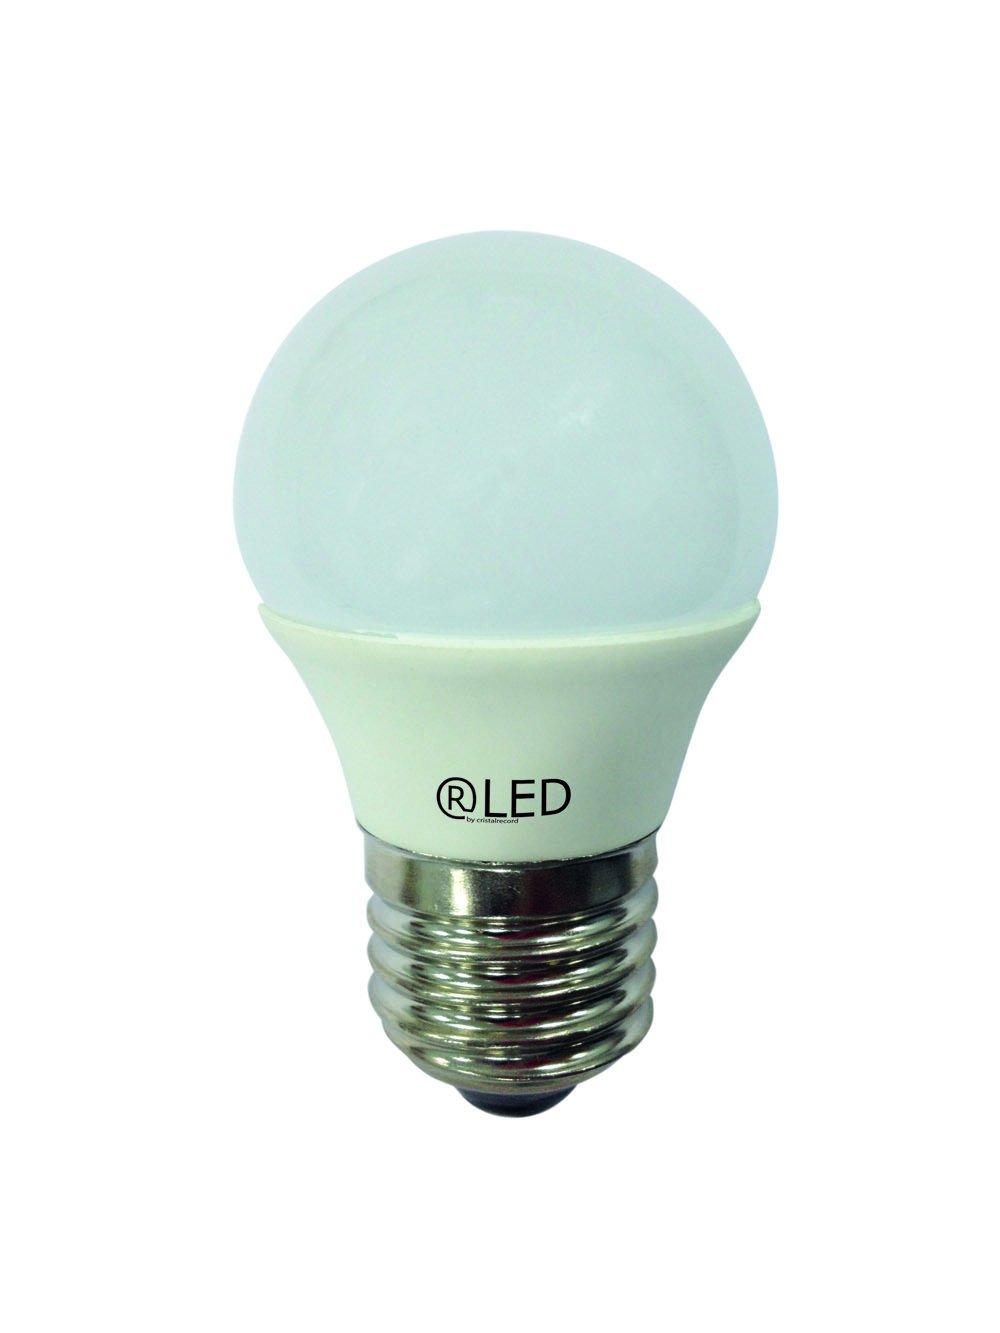 RLED Bombilla LED Esférica, Luz Neutra E27, 6 W, Blanco, 4.5 x 7.4 cm: Amazon.es: Iluminación